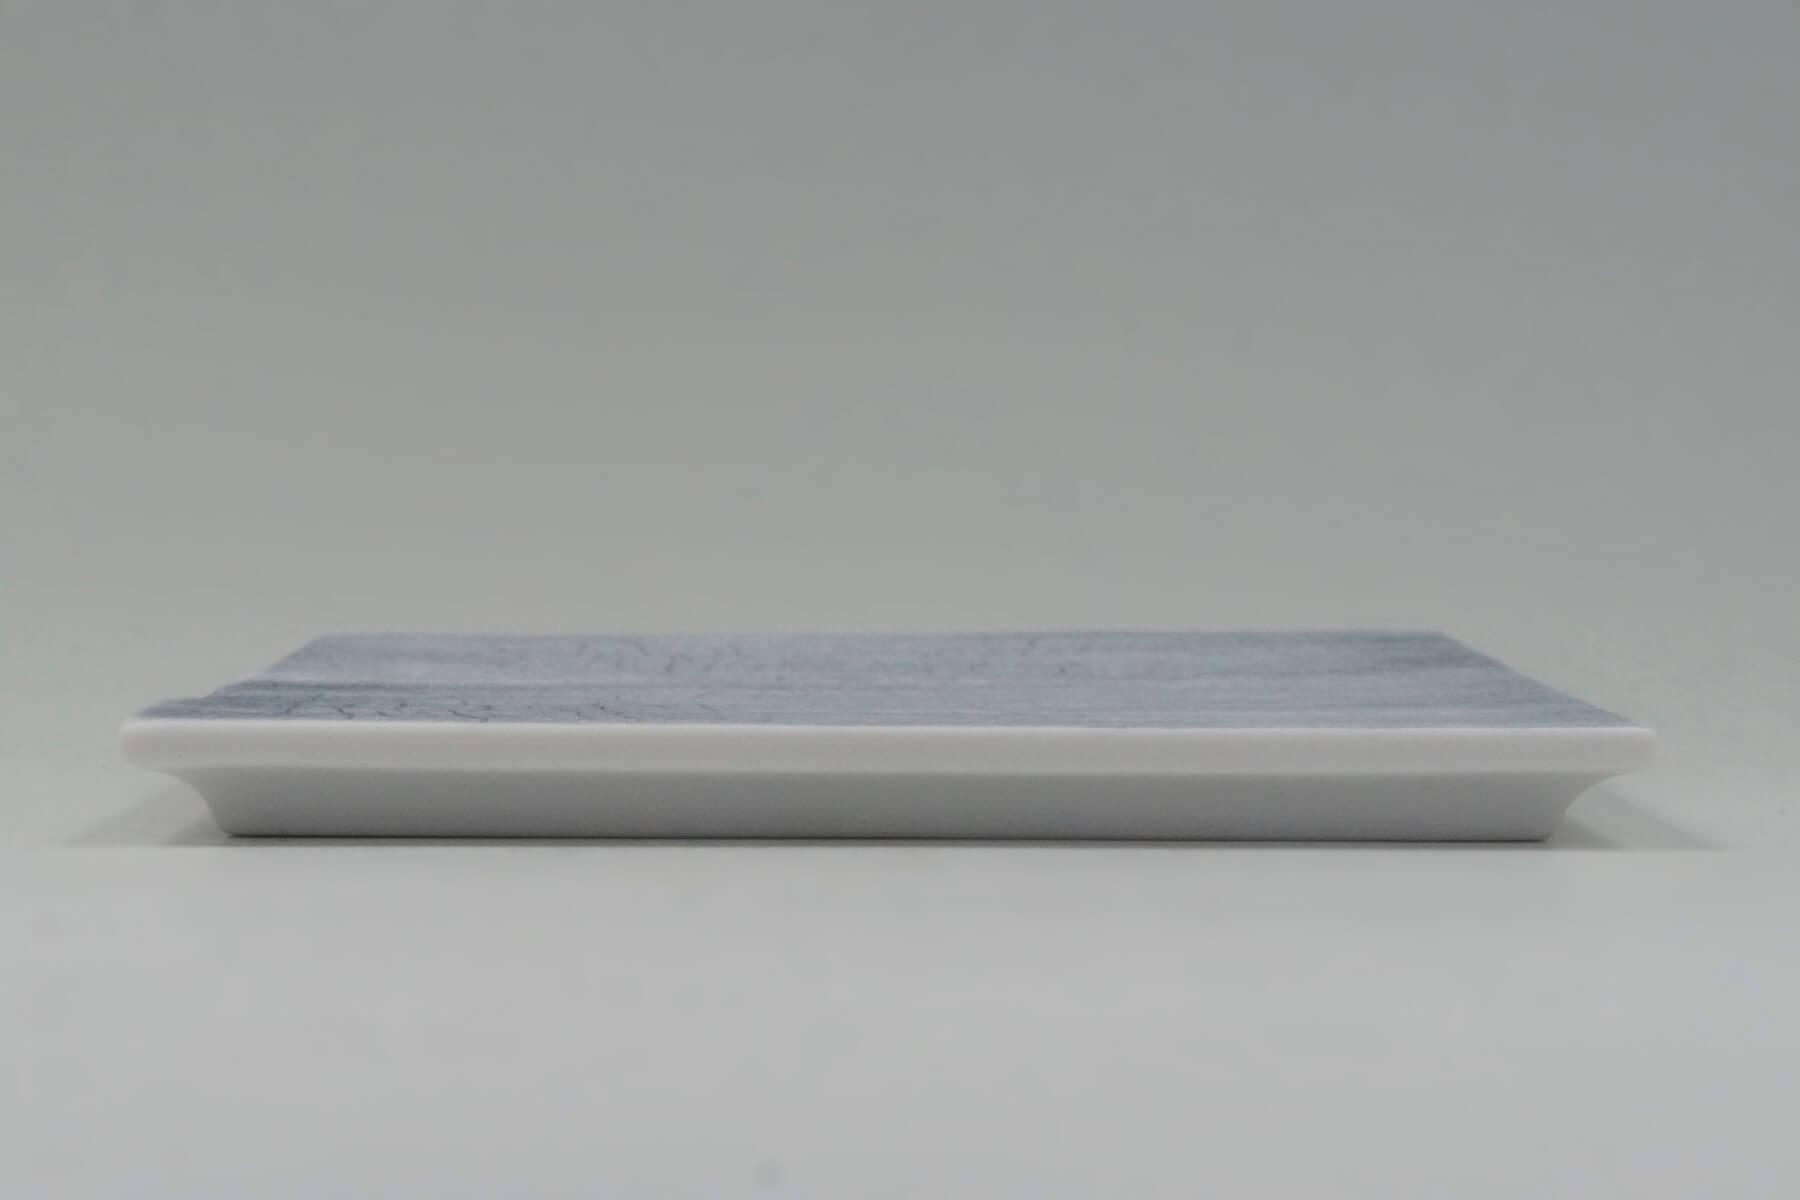 ymh0066